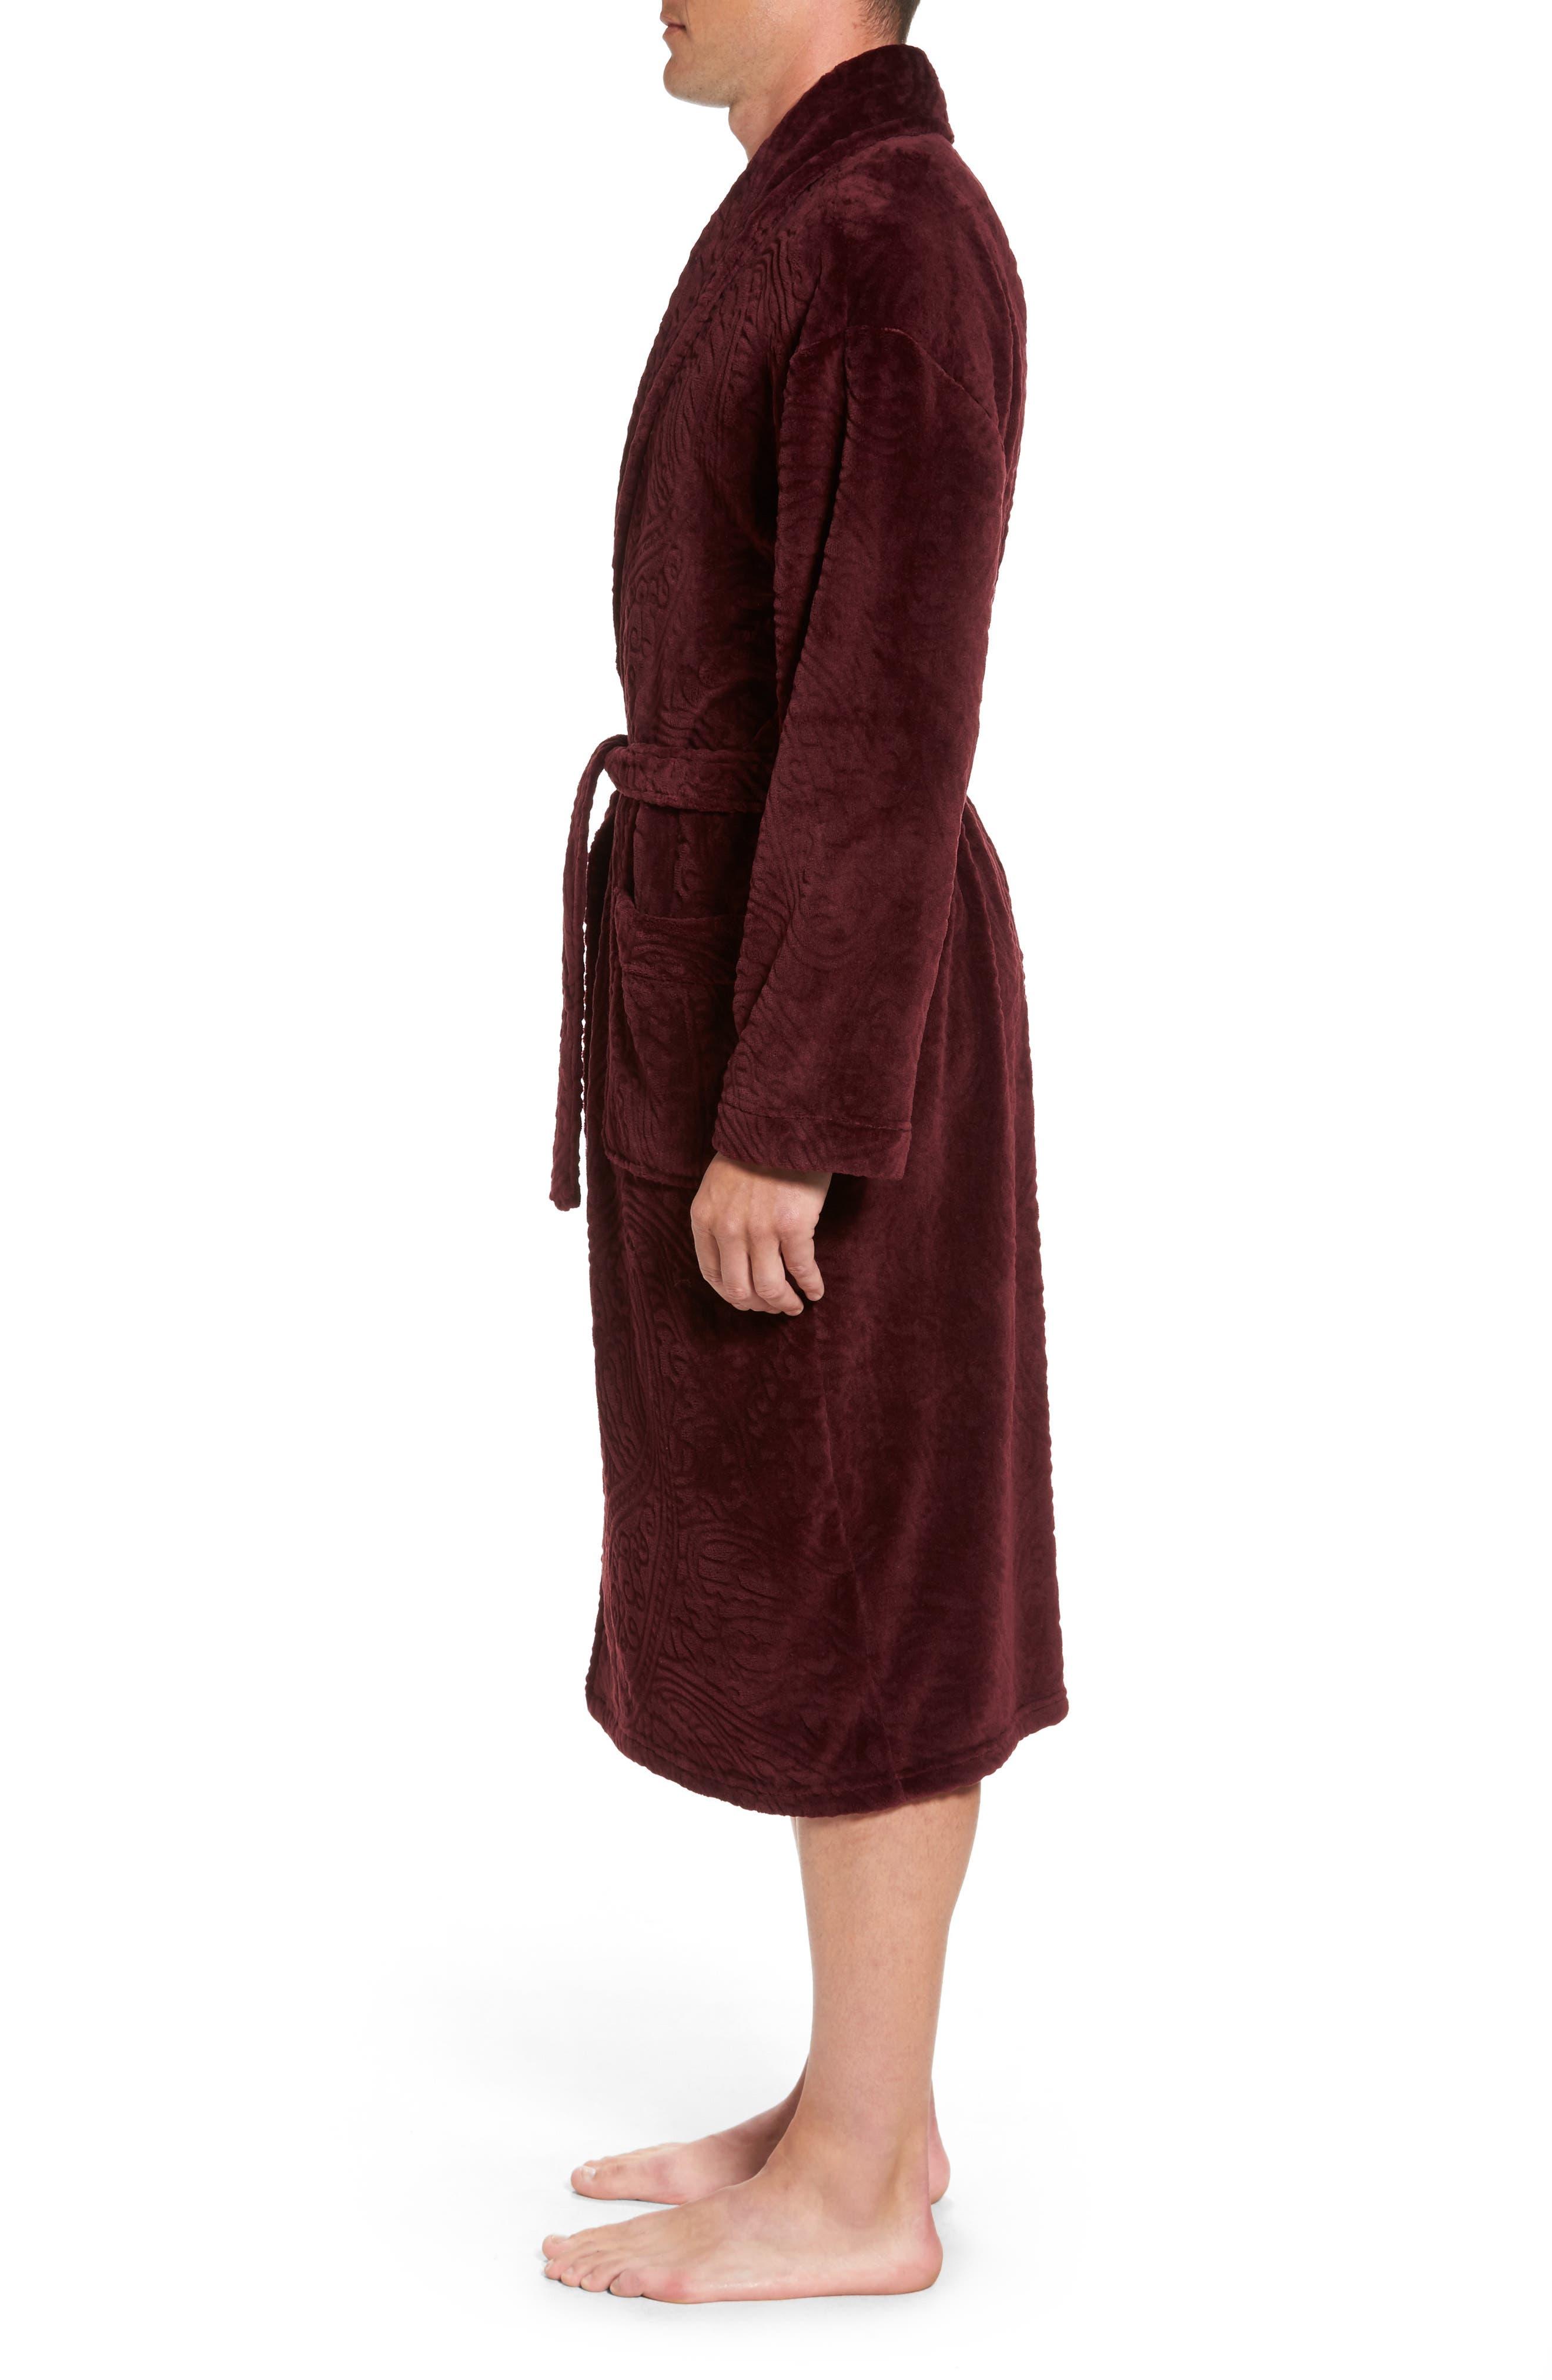 Midtown Robe,                             Alternate thumbnail 3, color,                             Burgundy Paisley